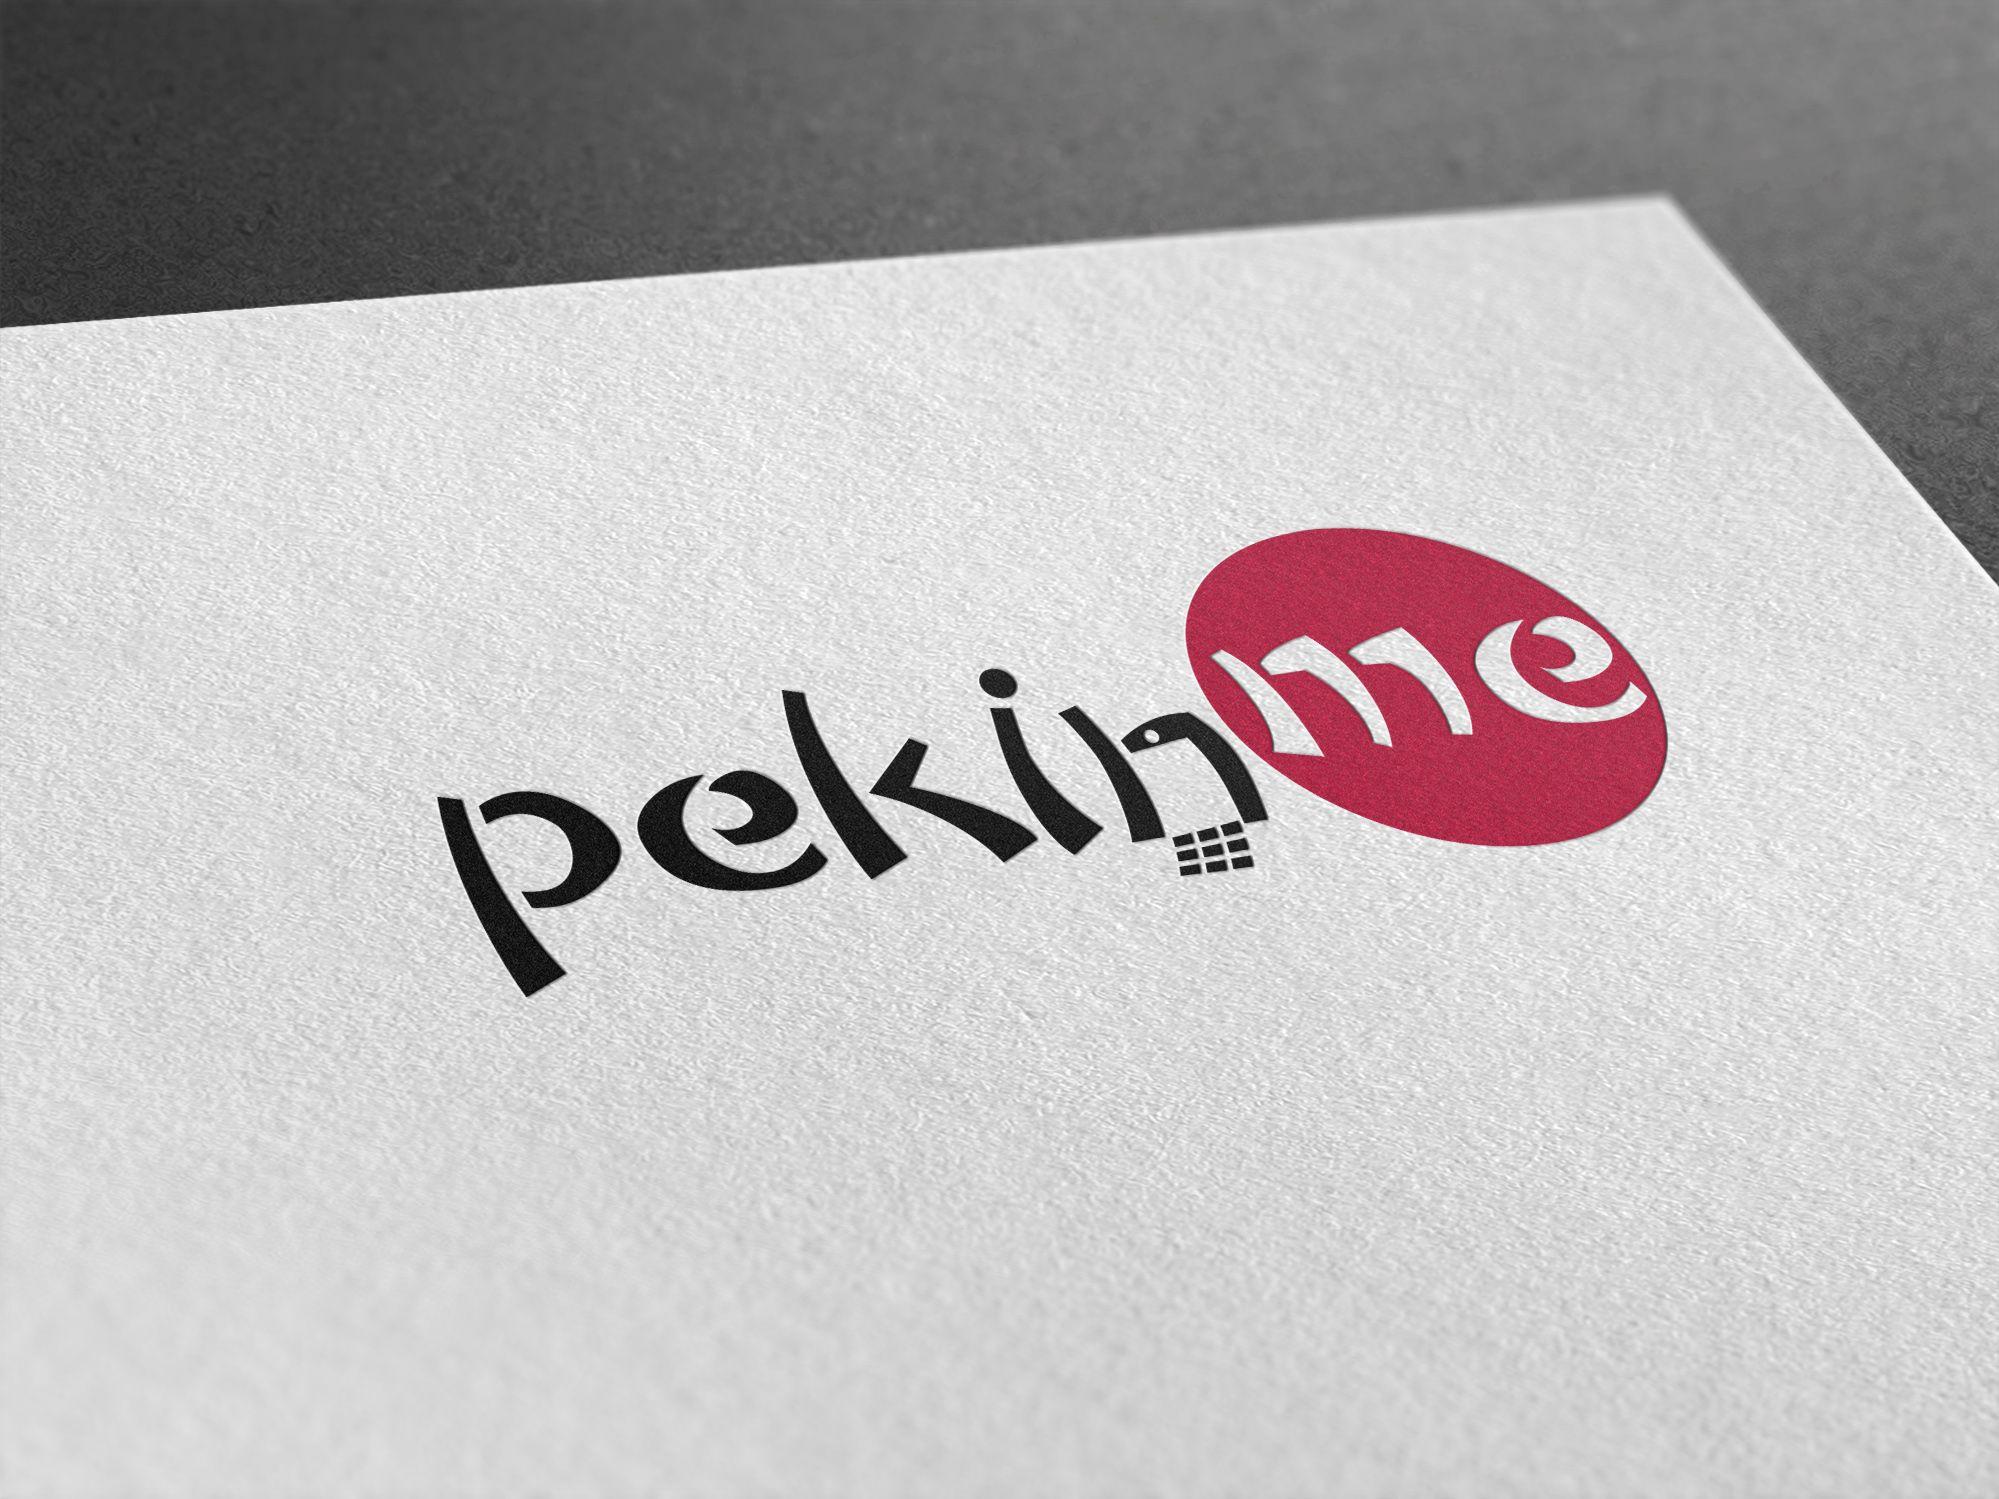 Логотип для компании pekin.me - дизайнер U4po4mak